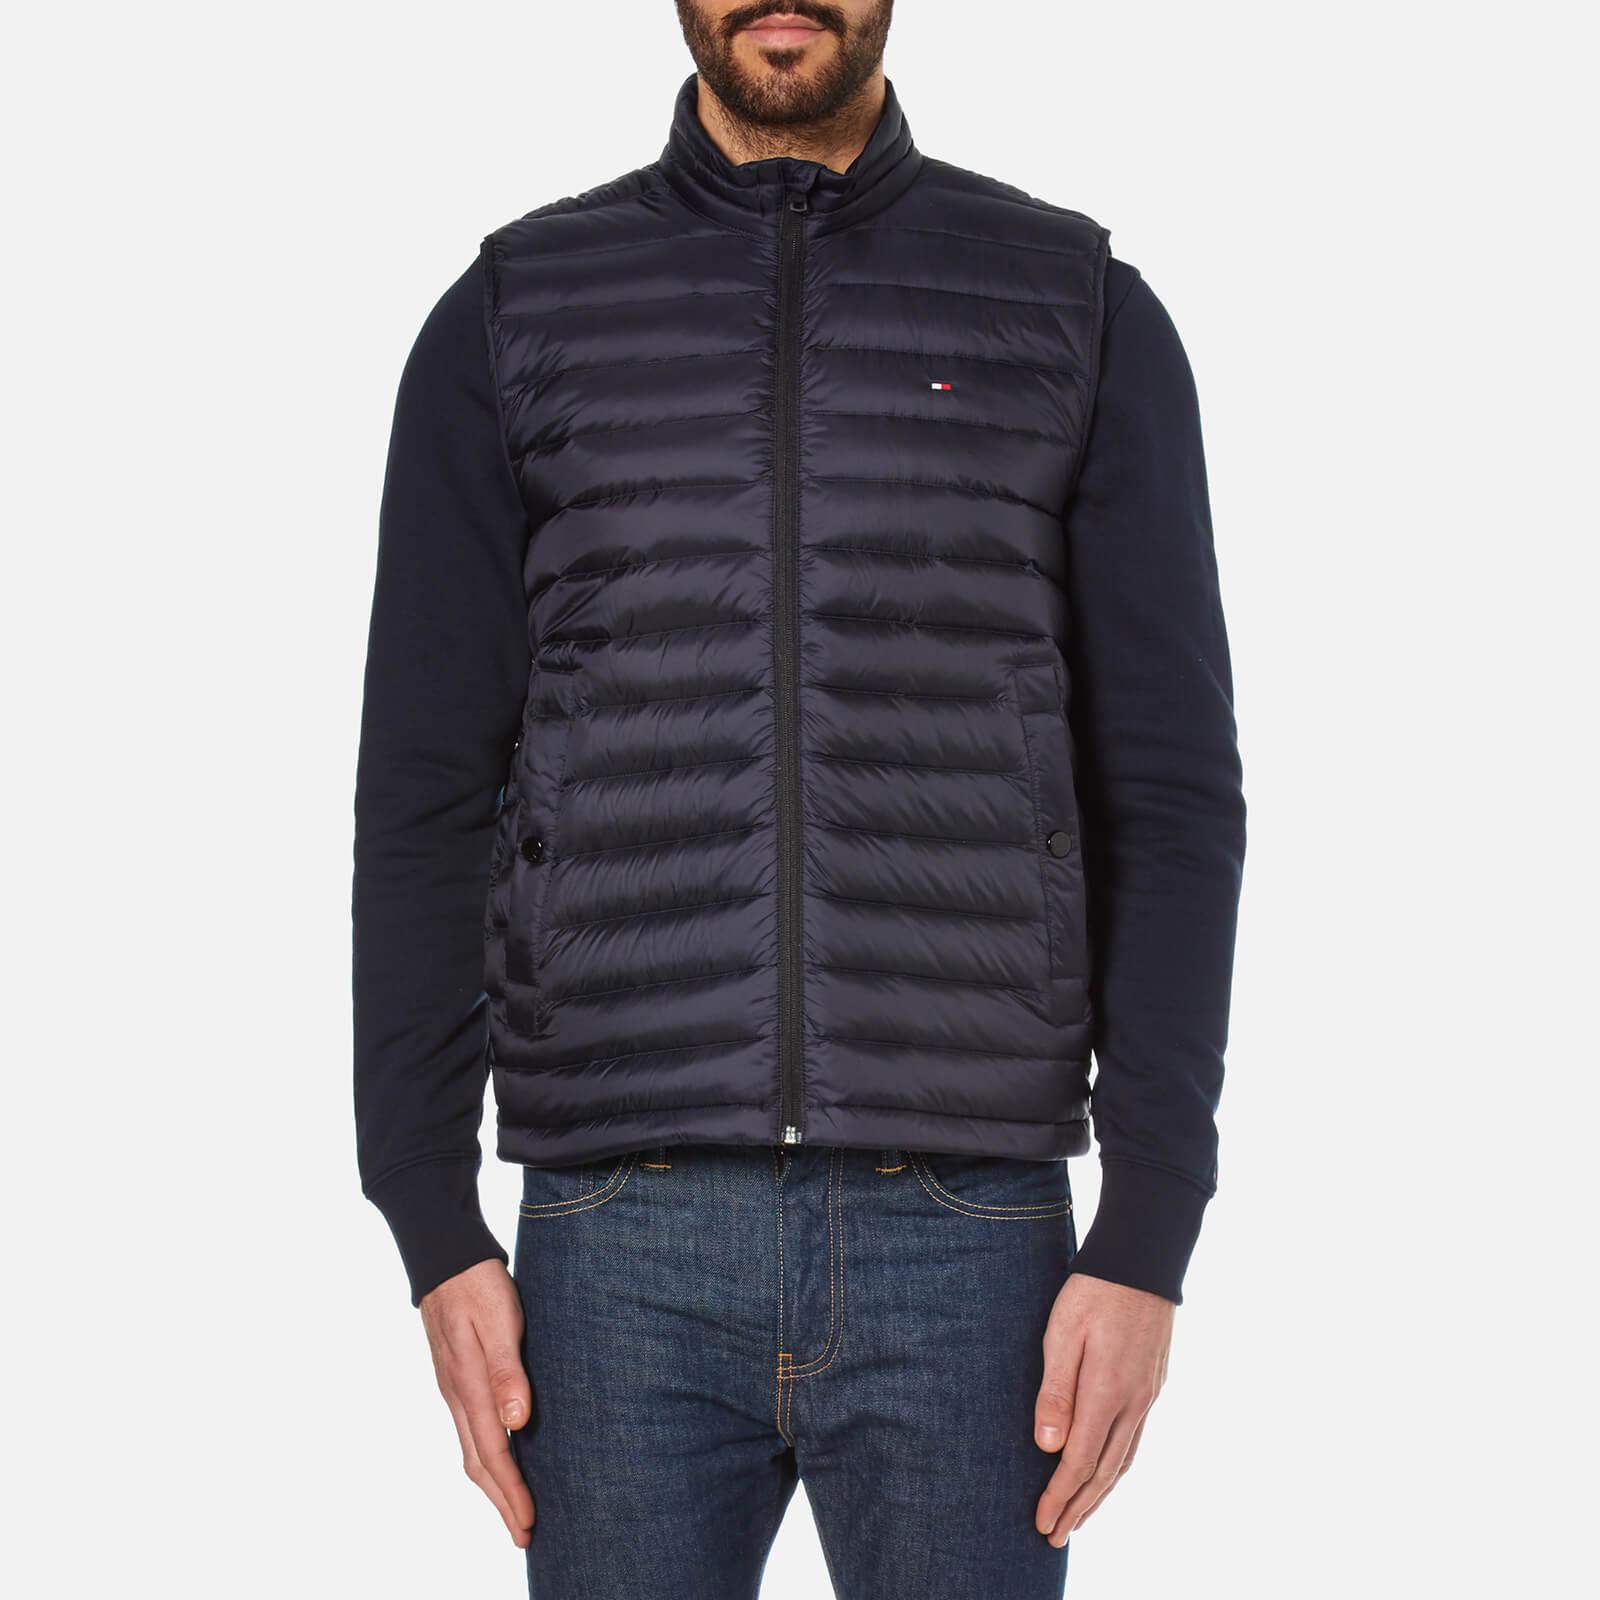 391dd0725 Tommy Hilfiger Men's Lightweight Packable Down Vest - Midnight